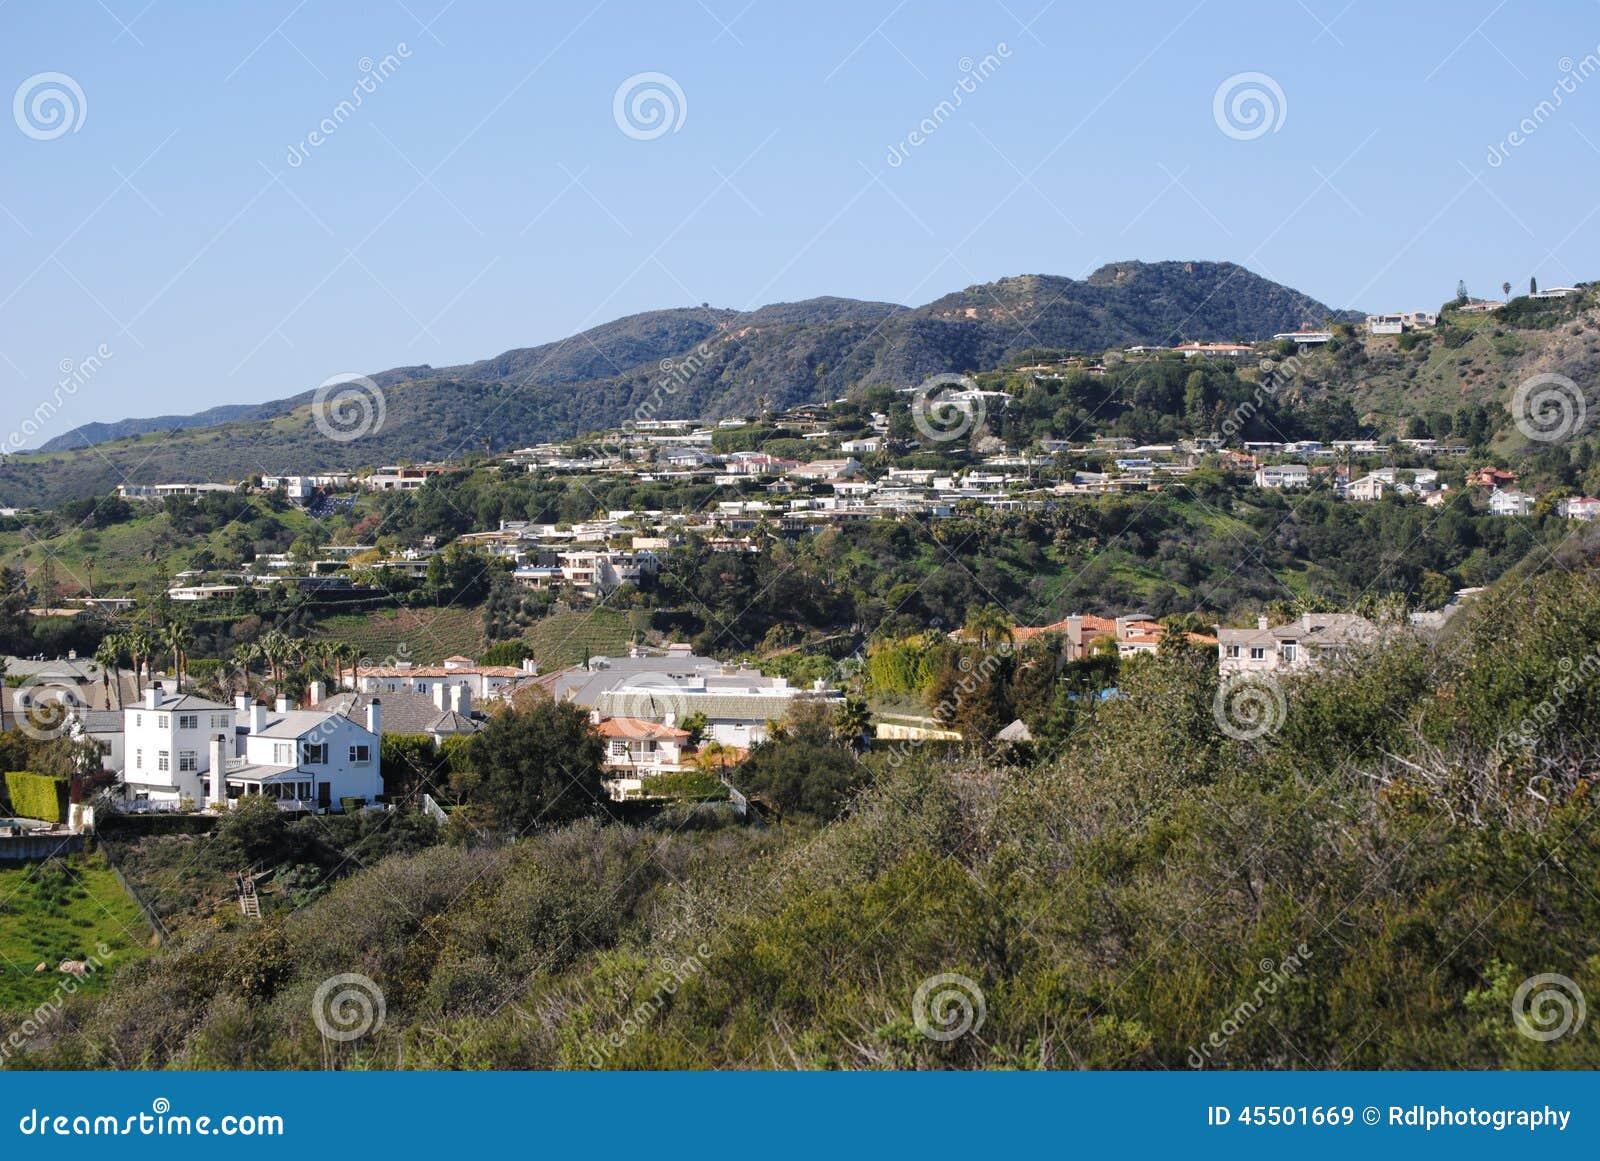 maisons californiennes photo stock image 45501669. Black Bedroom Furniture Sets. Home Design Ideas